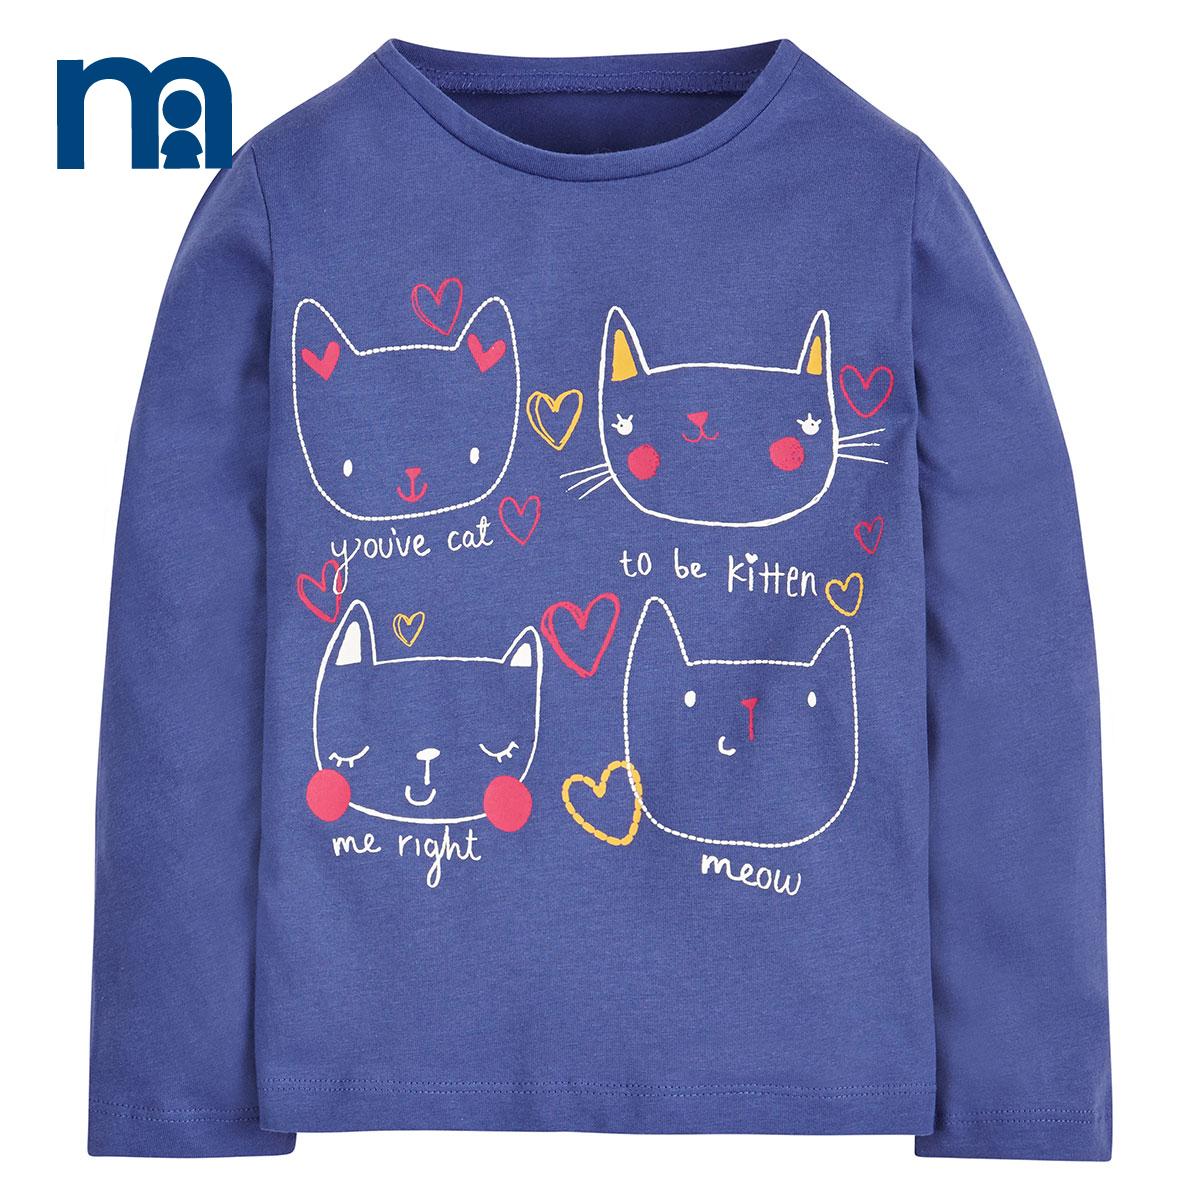 mothercare英國 女童長袖T恤純棉 貓咪款 女孩打底上衣